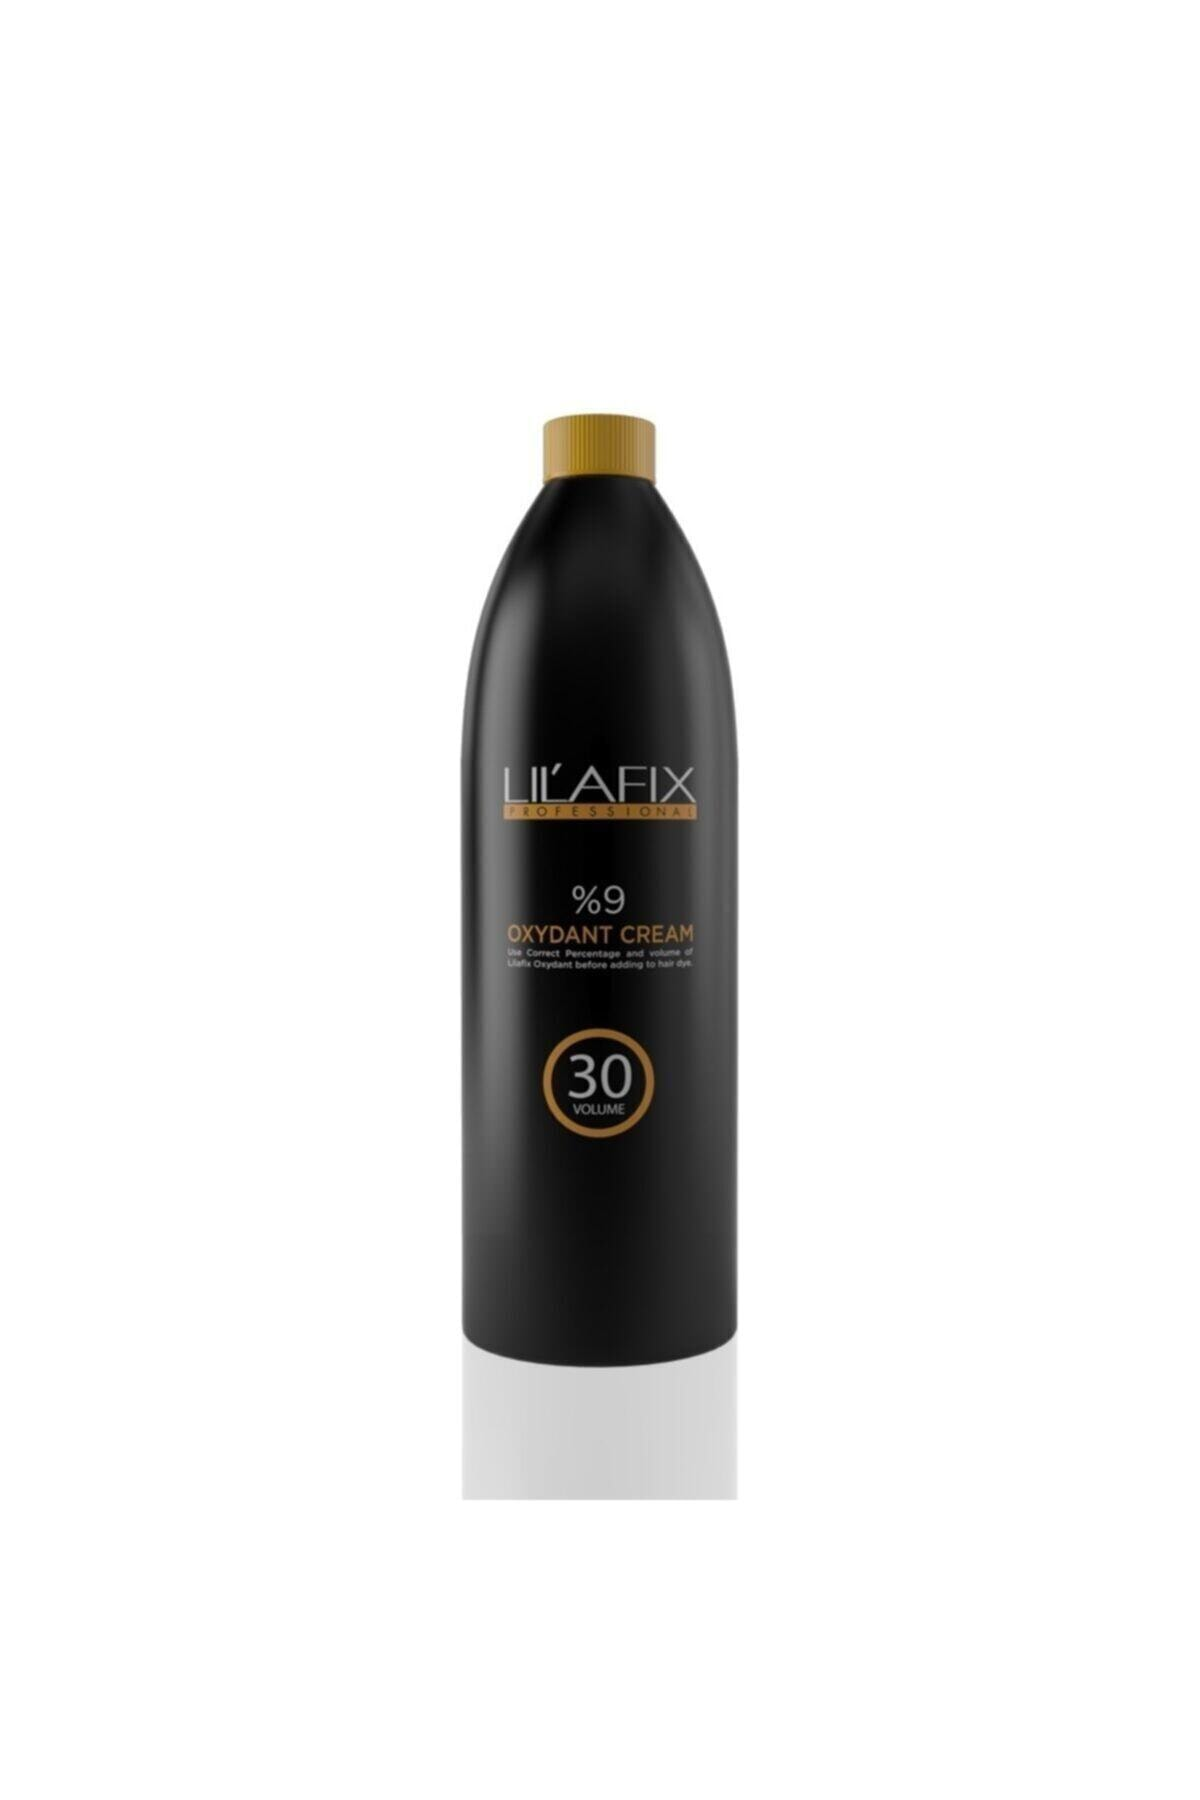 Lilafıx 30 Volume (%9) Oksidan Krem 1000 ml